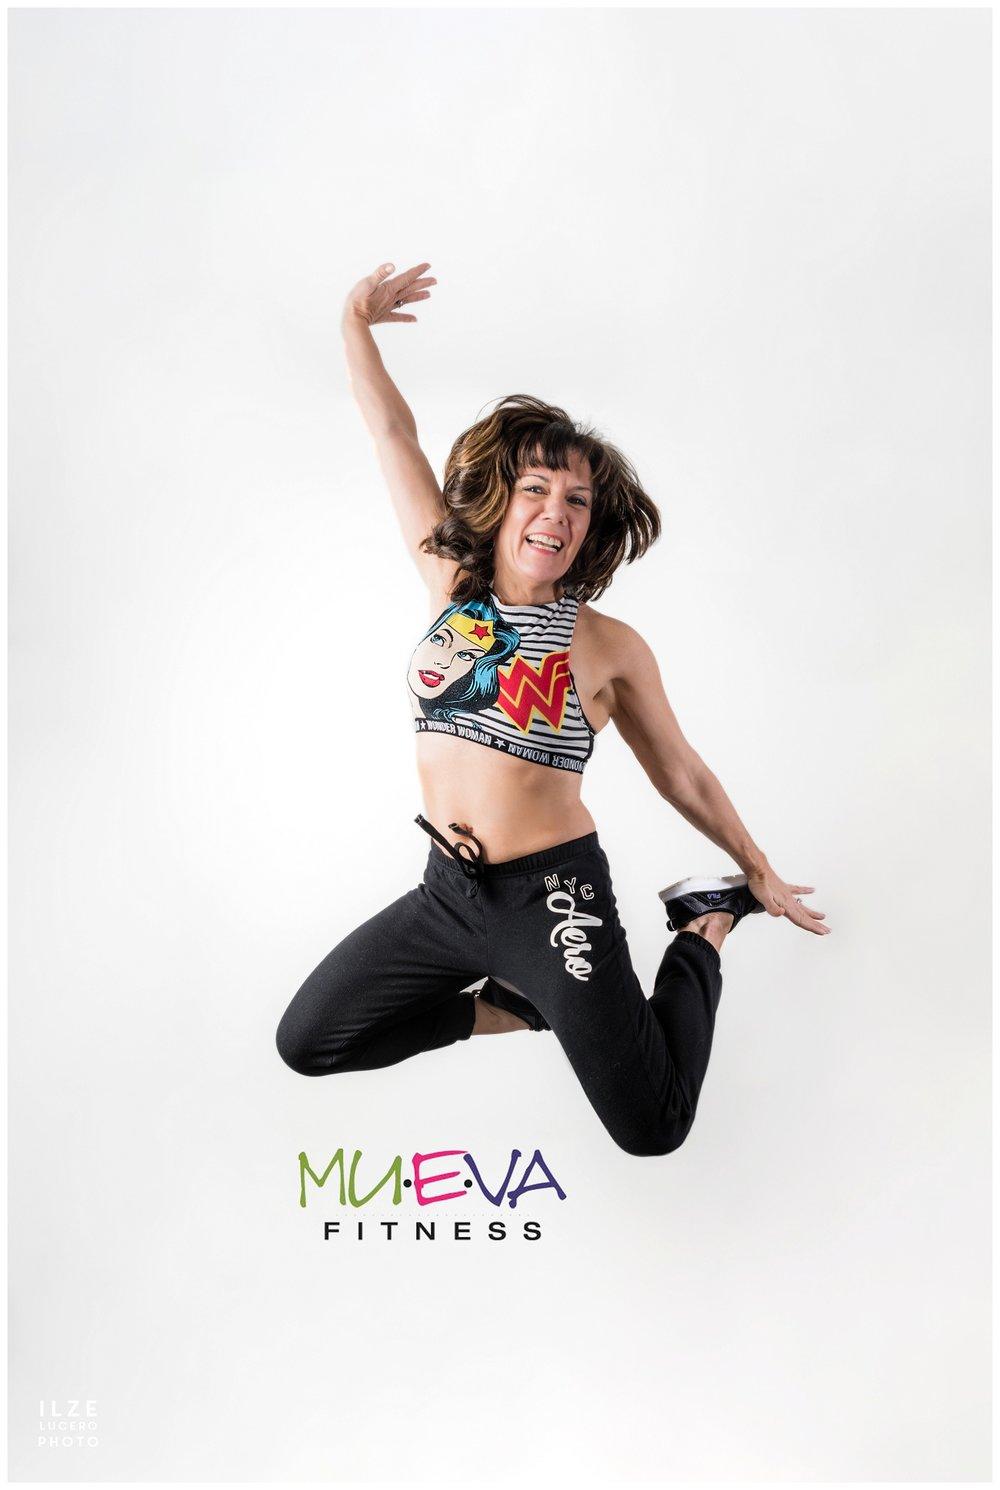 Mueva Fitness